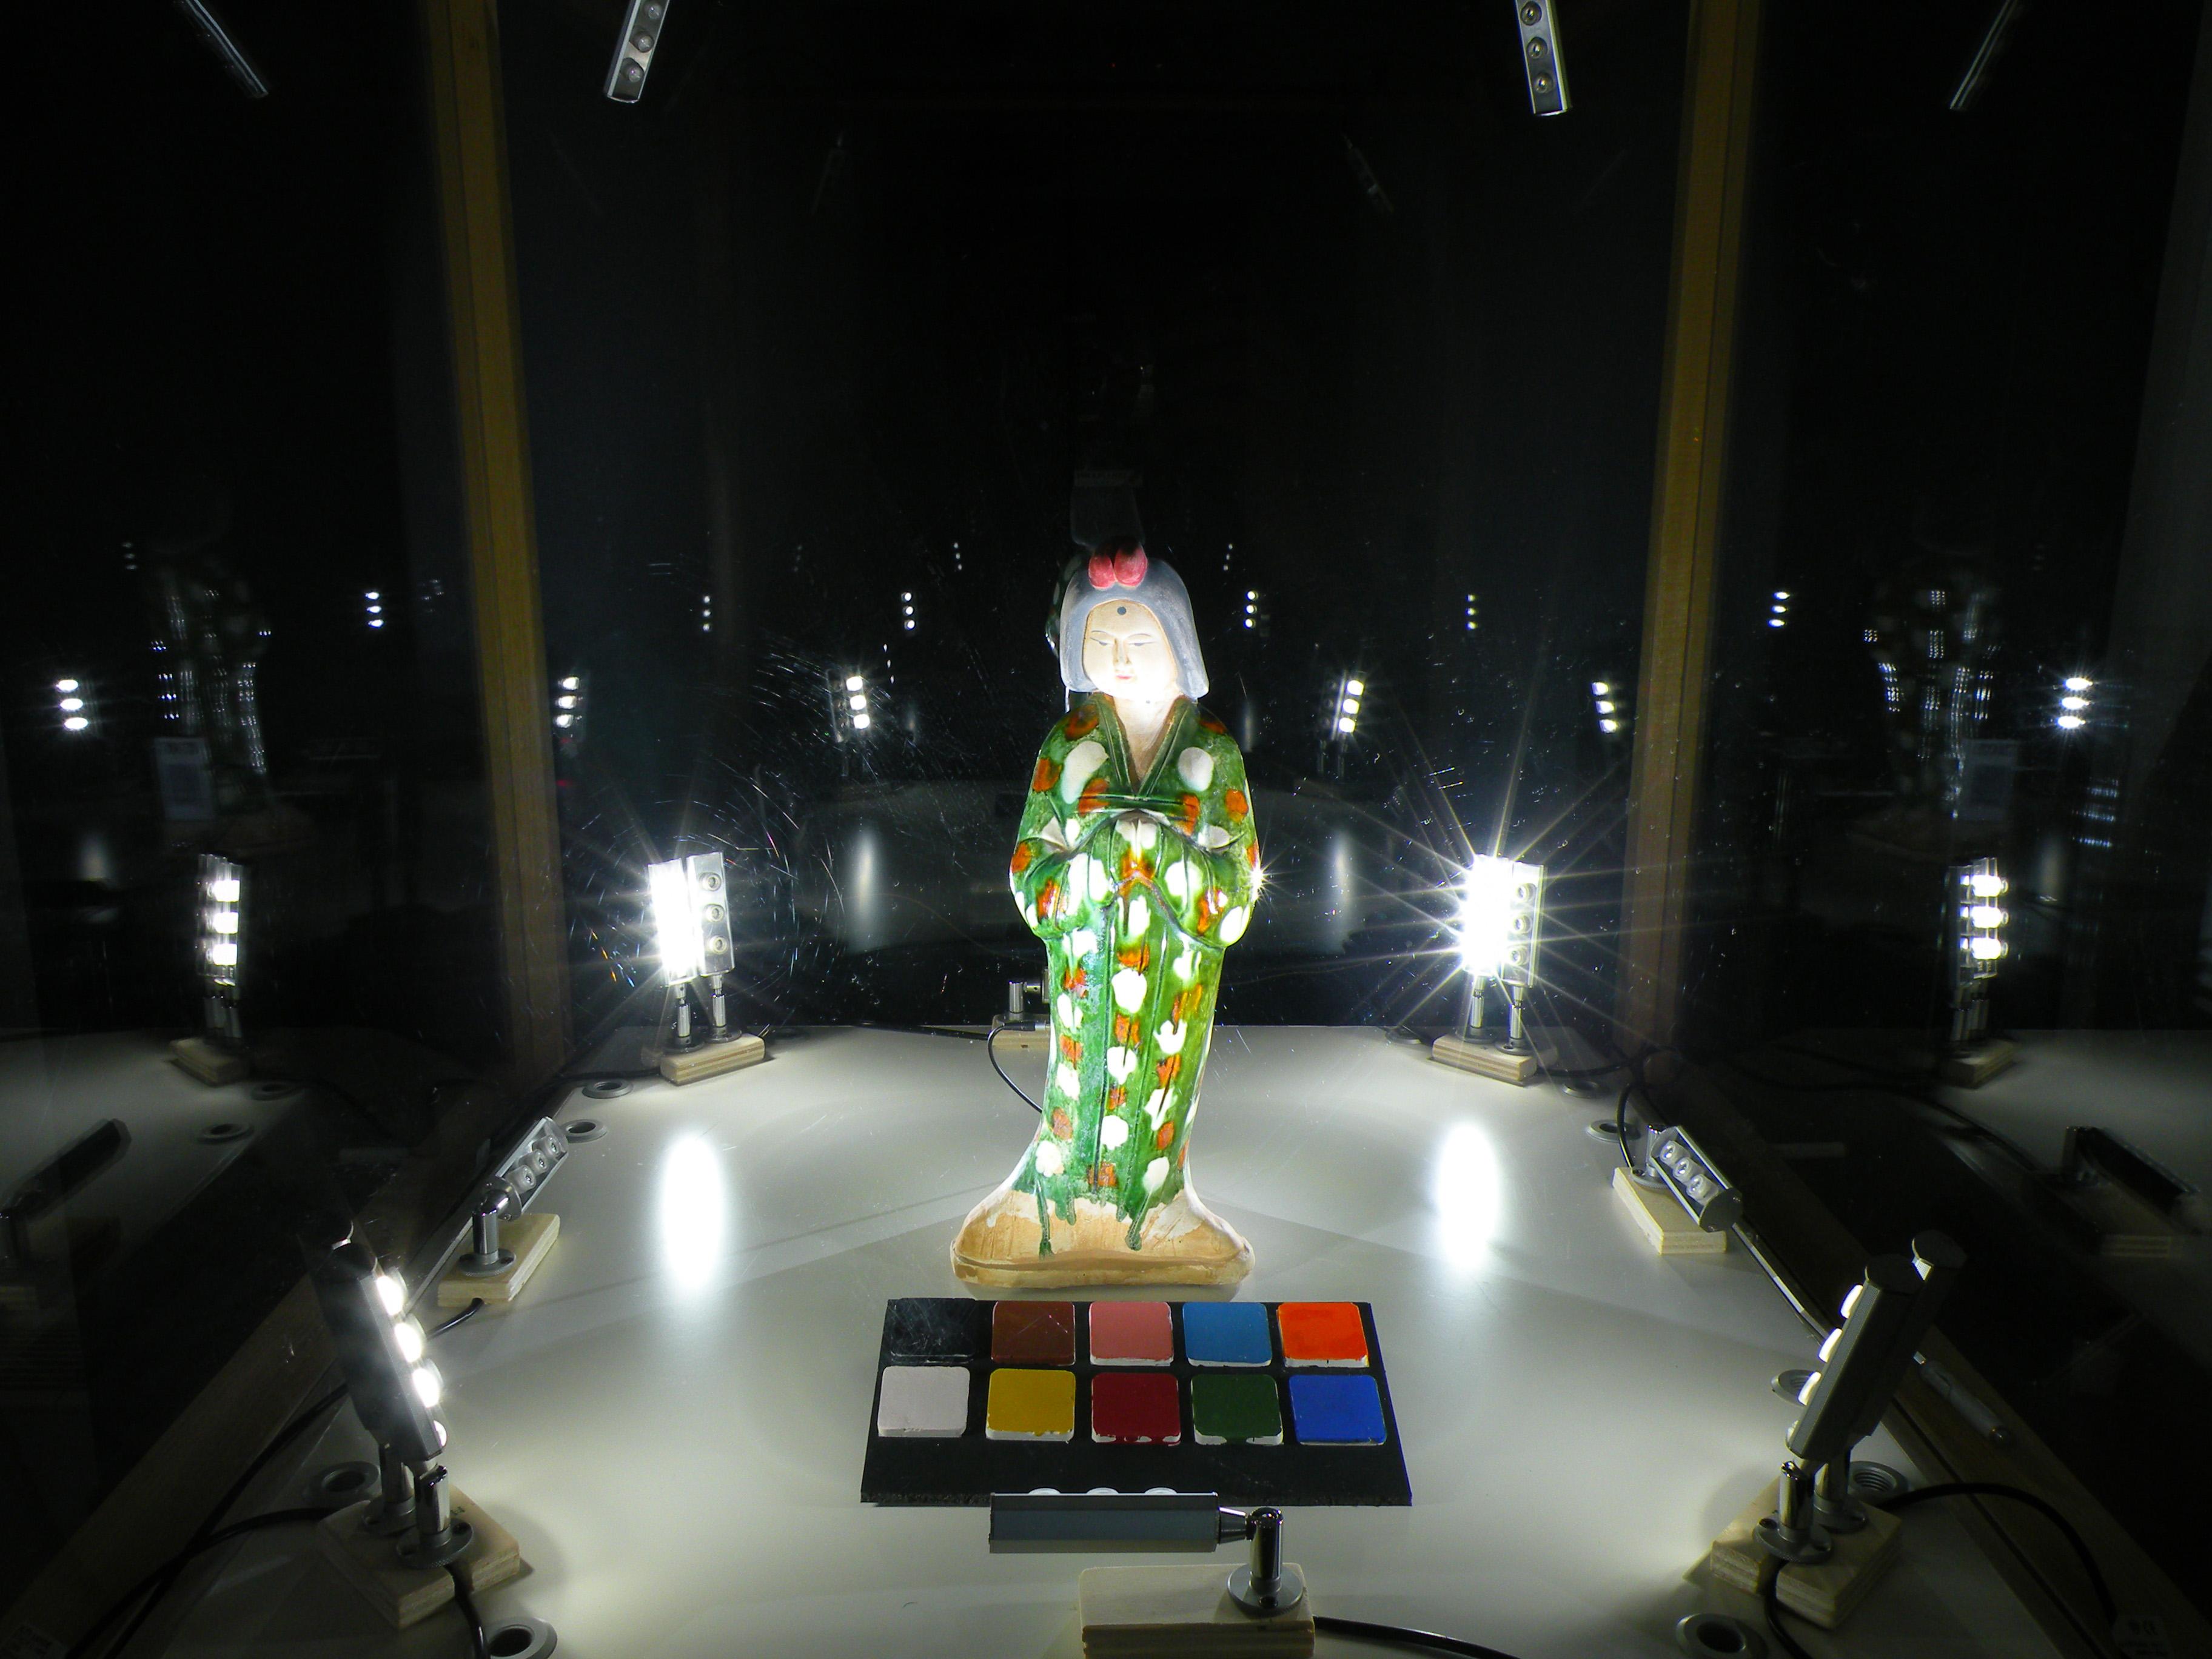 Sistemi Di Illuminazione A Led sistemi led per applicazioni in vetrine museali - luce e design